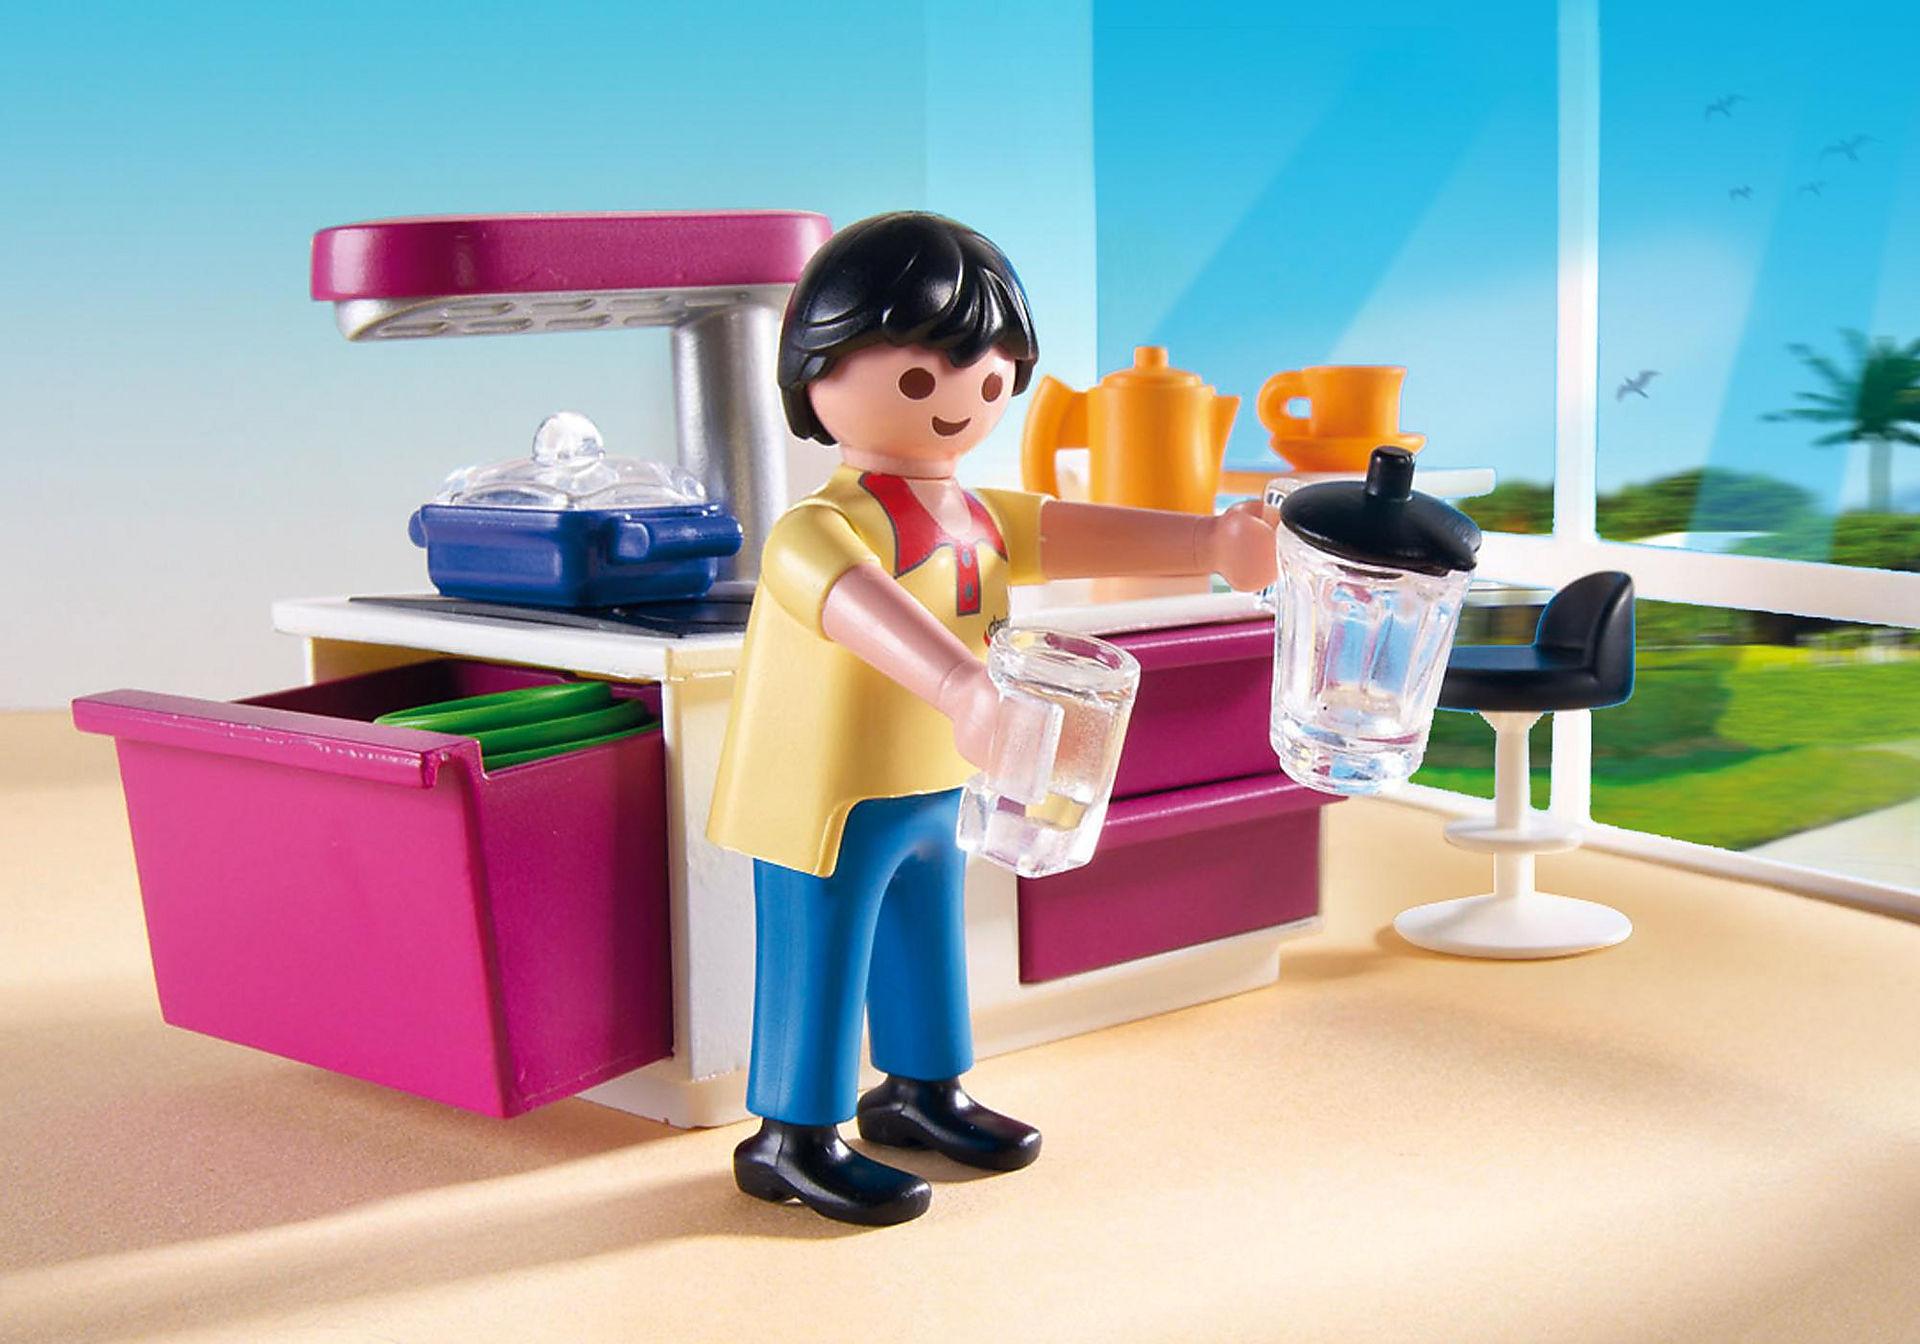 http://media.playmobil.com/i/playmobil/5582_product_extra1/Cuisine avec îlot